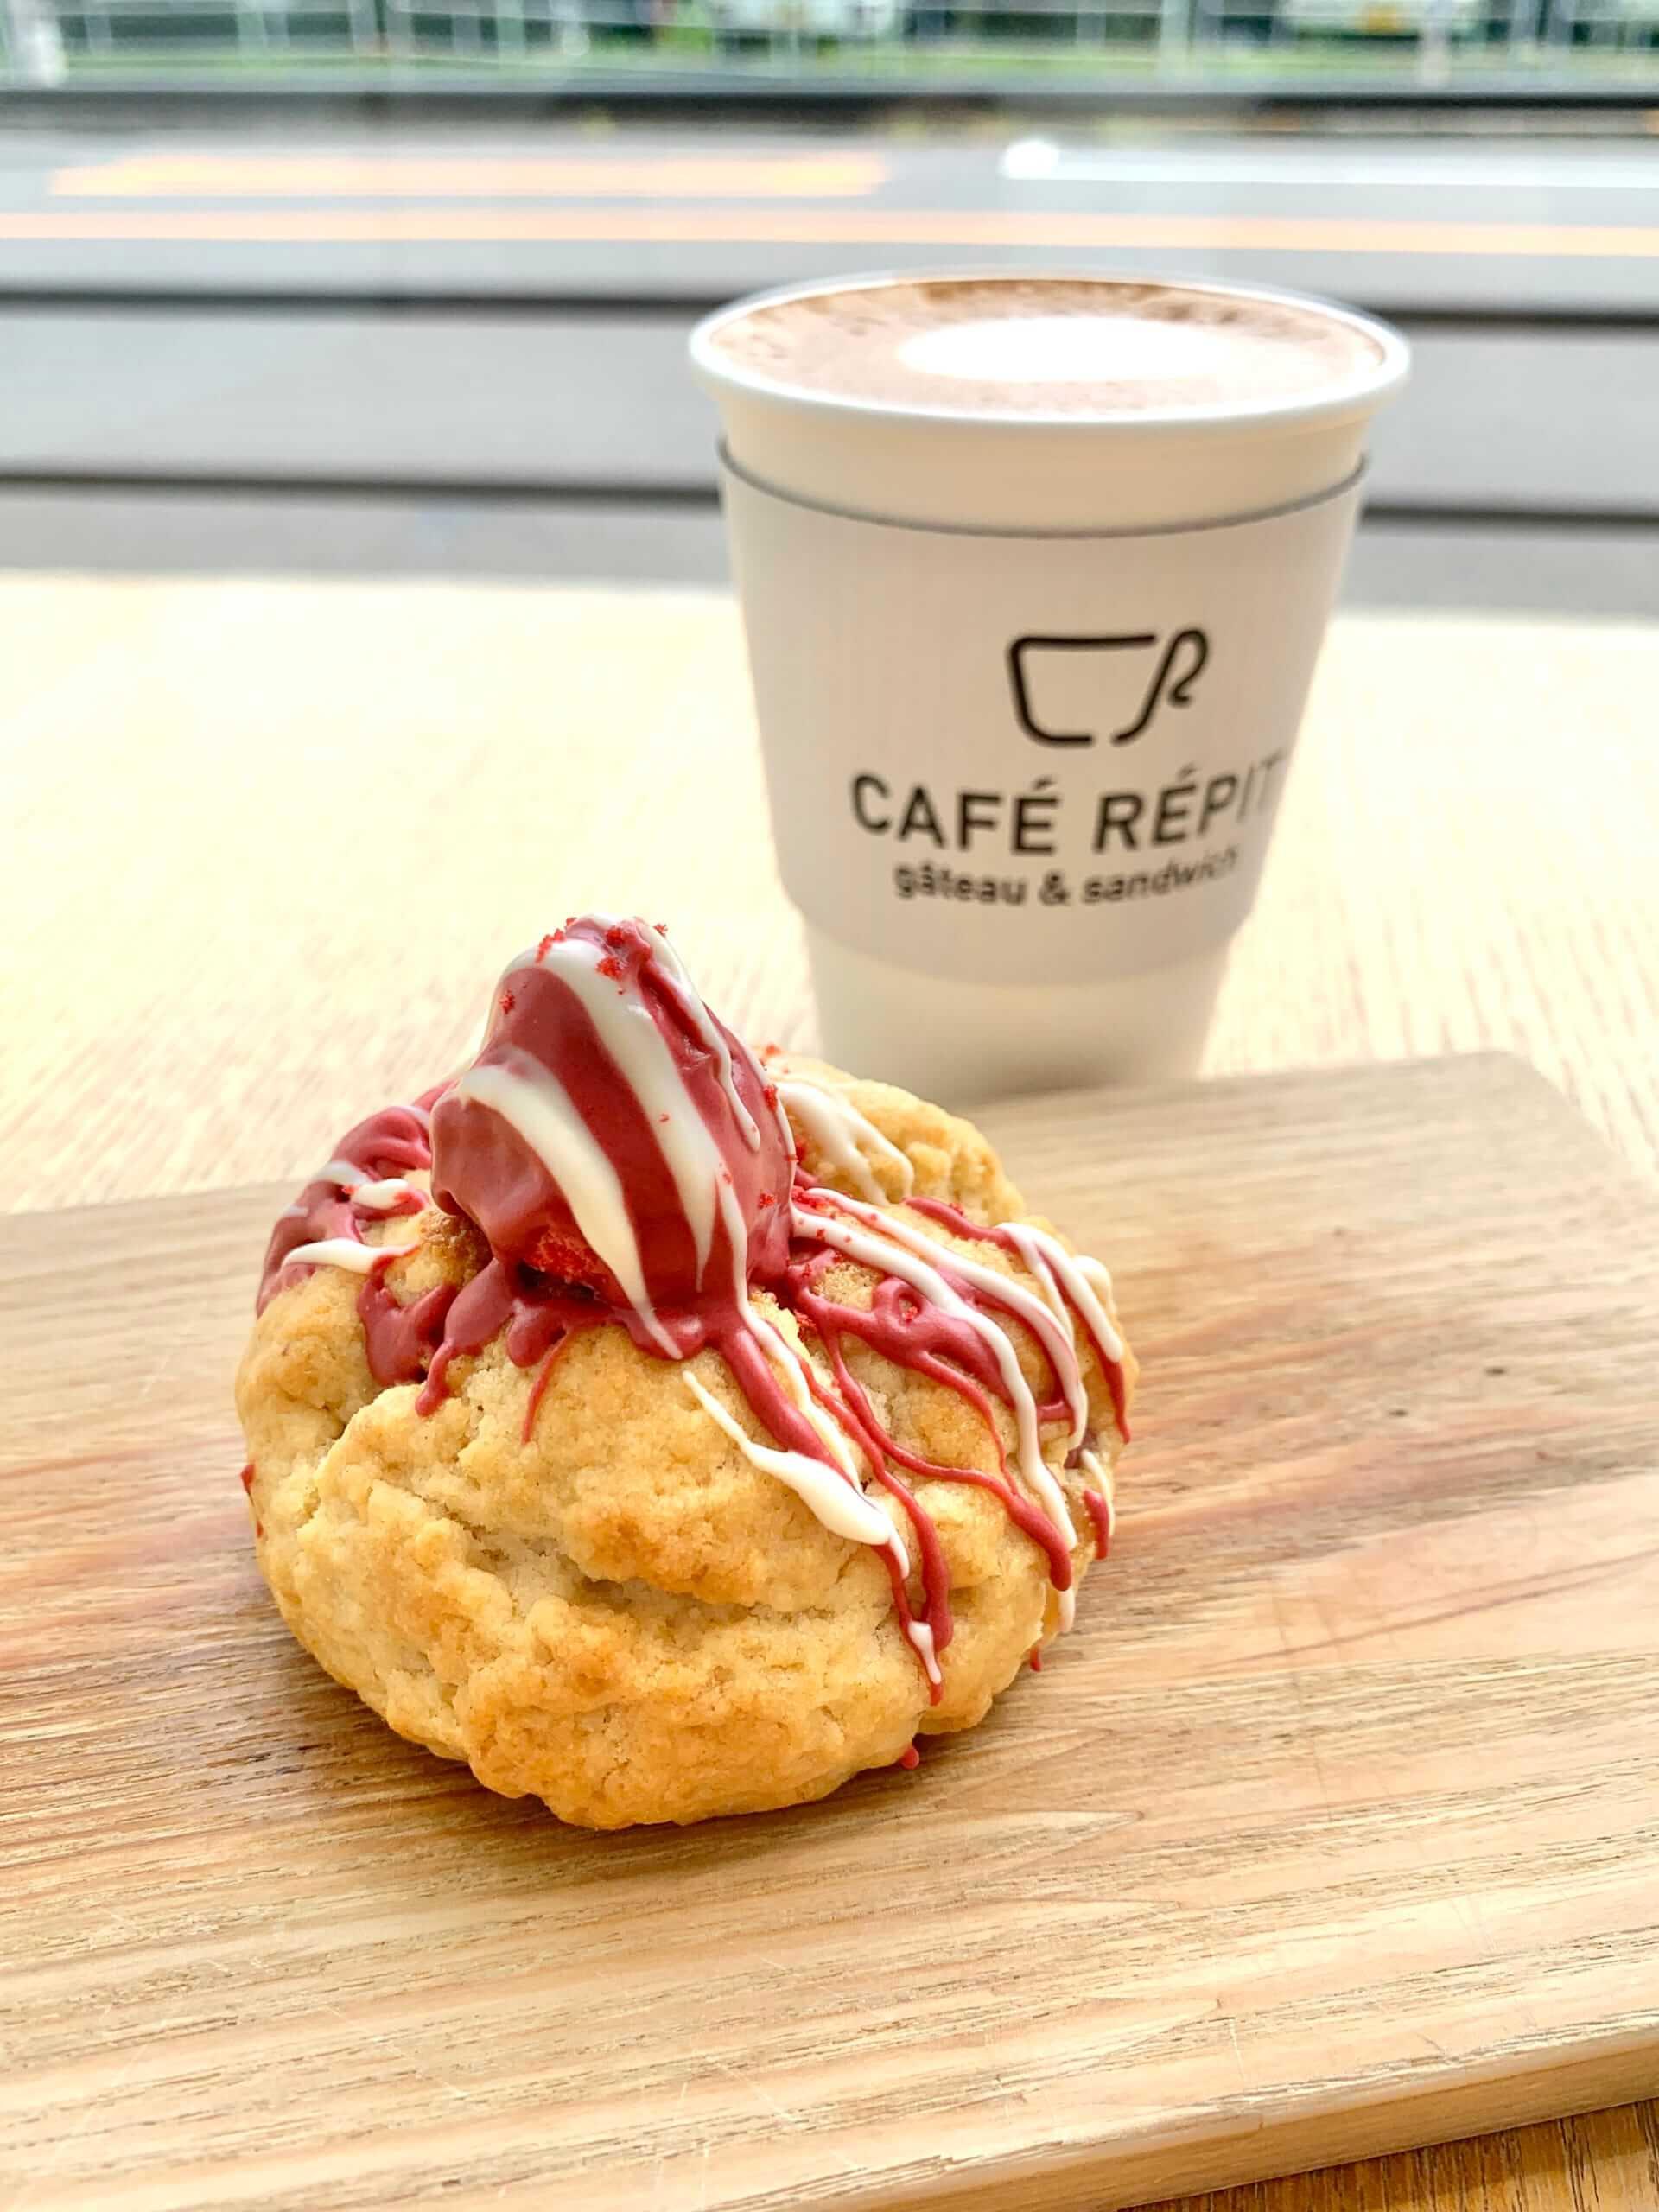 CAFÉ RÉPIT (カフェレピ)のケーク・スコーン 苺みるく・チョコ/¥360(税抜き)